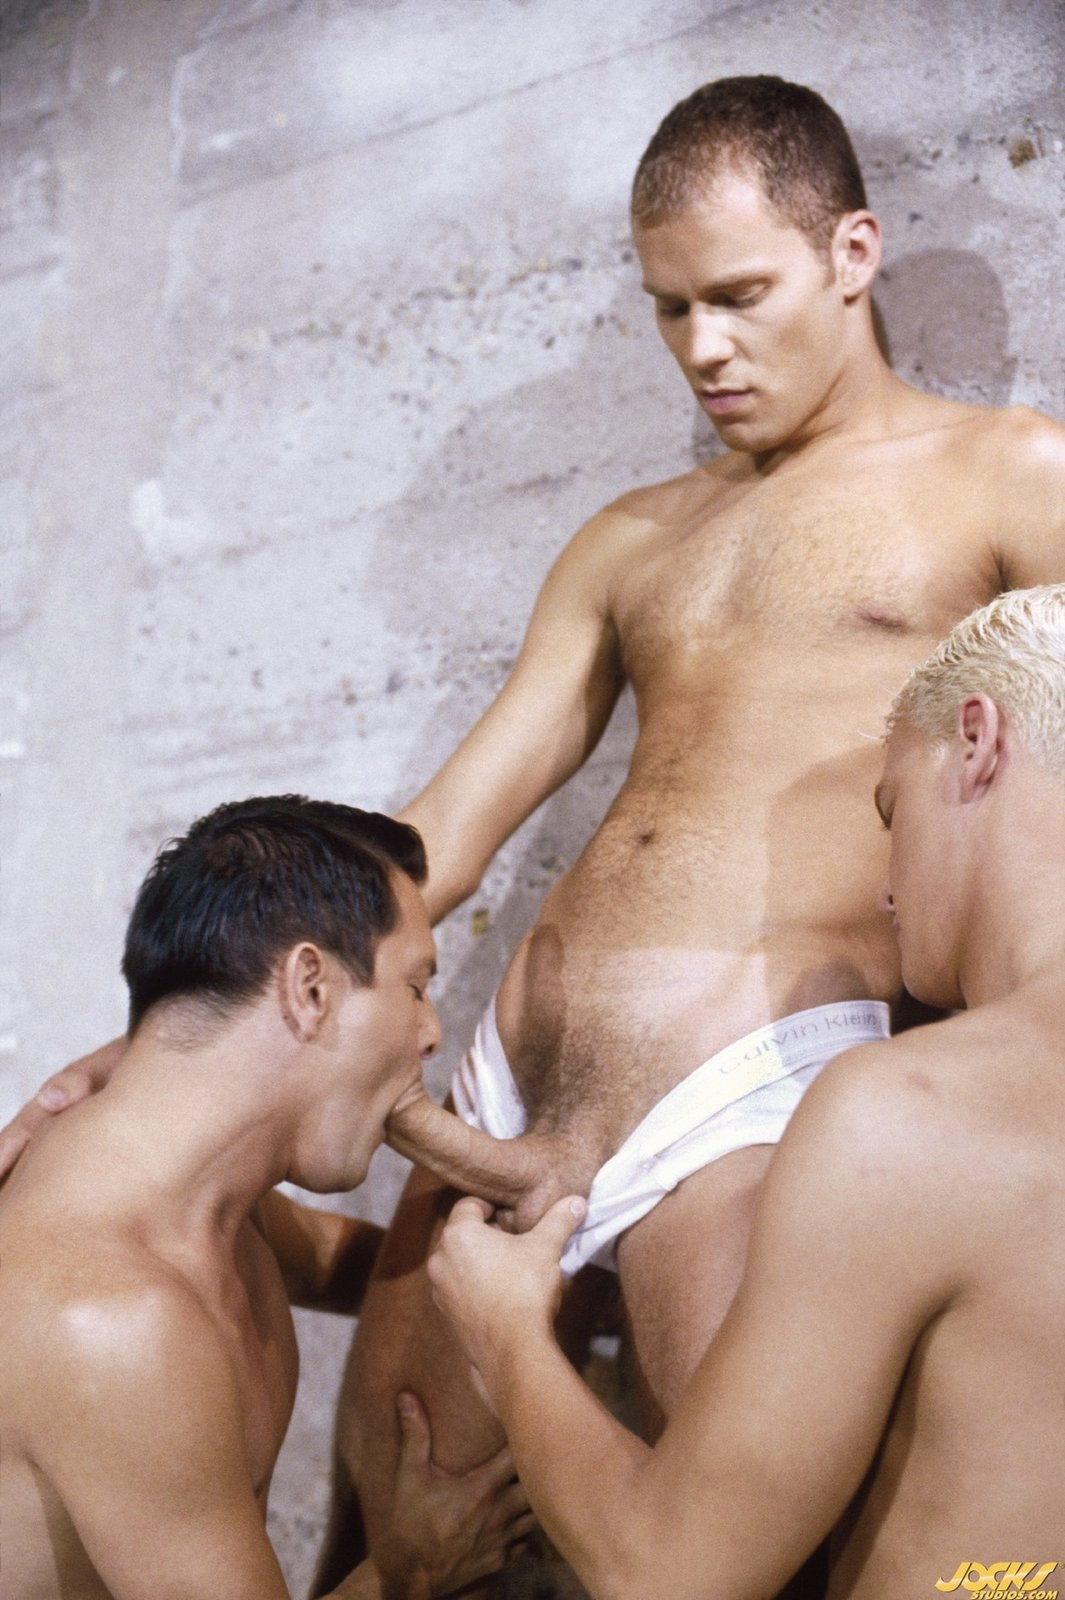 squirting-matt-majors-gay-spike-rockwell